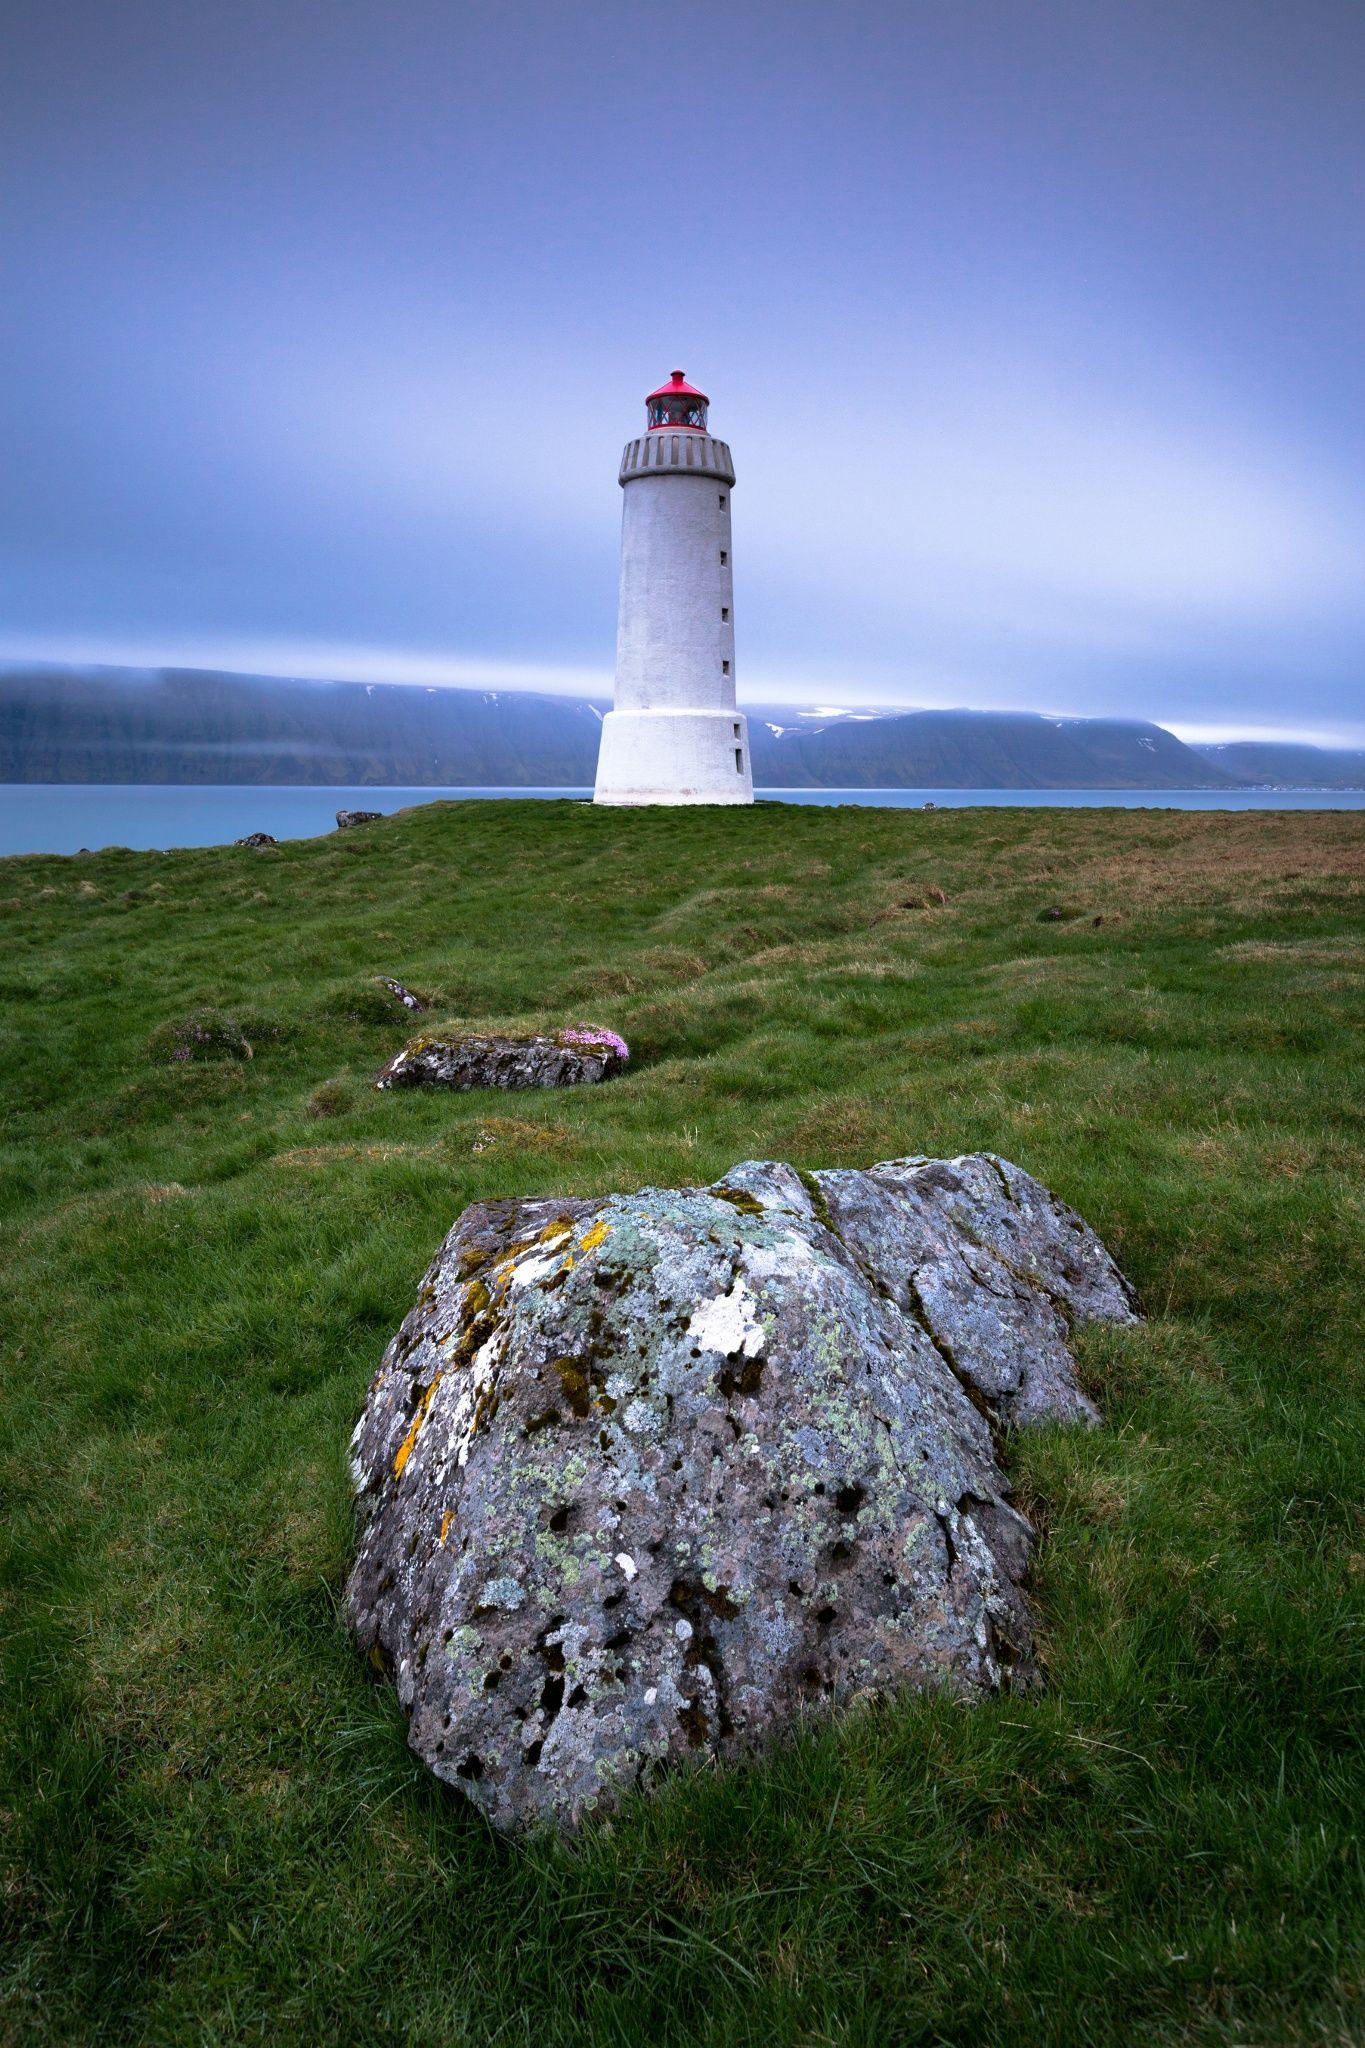 icelandic lighthouse by jeanjoaquim on 500px